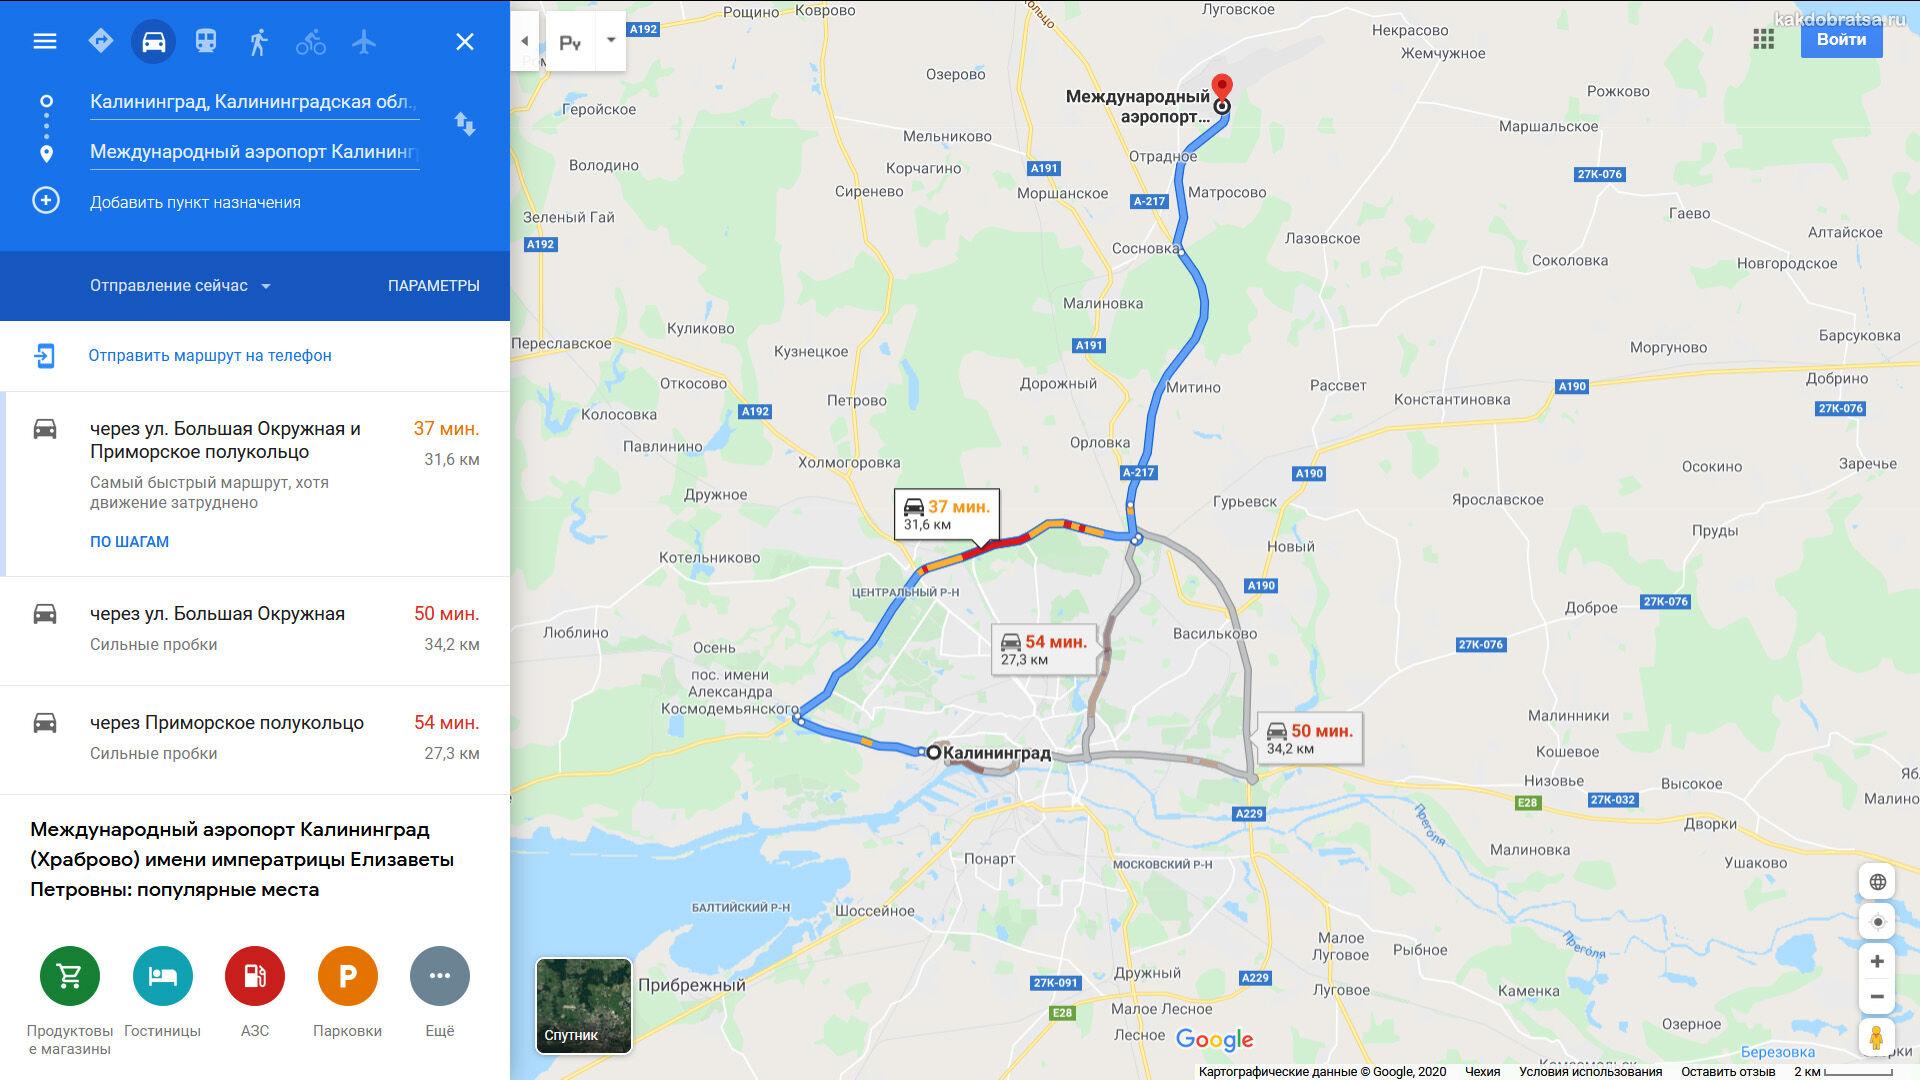 Аэропорт Калининграда расстояние до города на карте